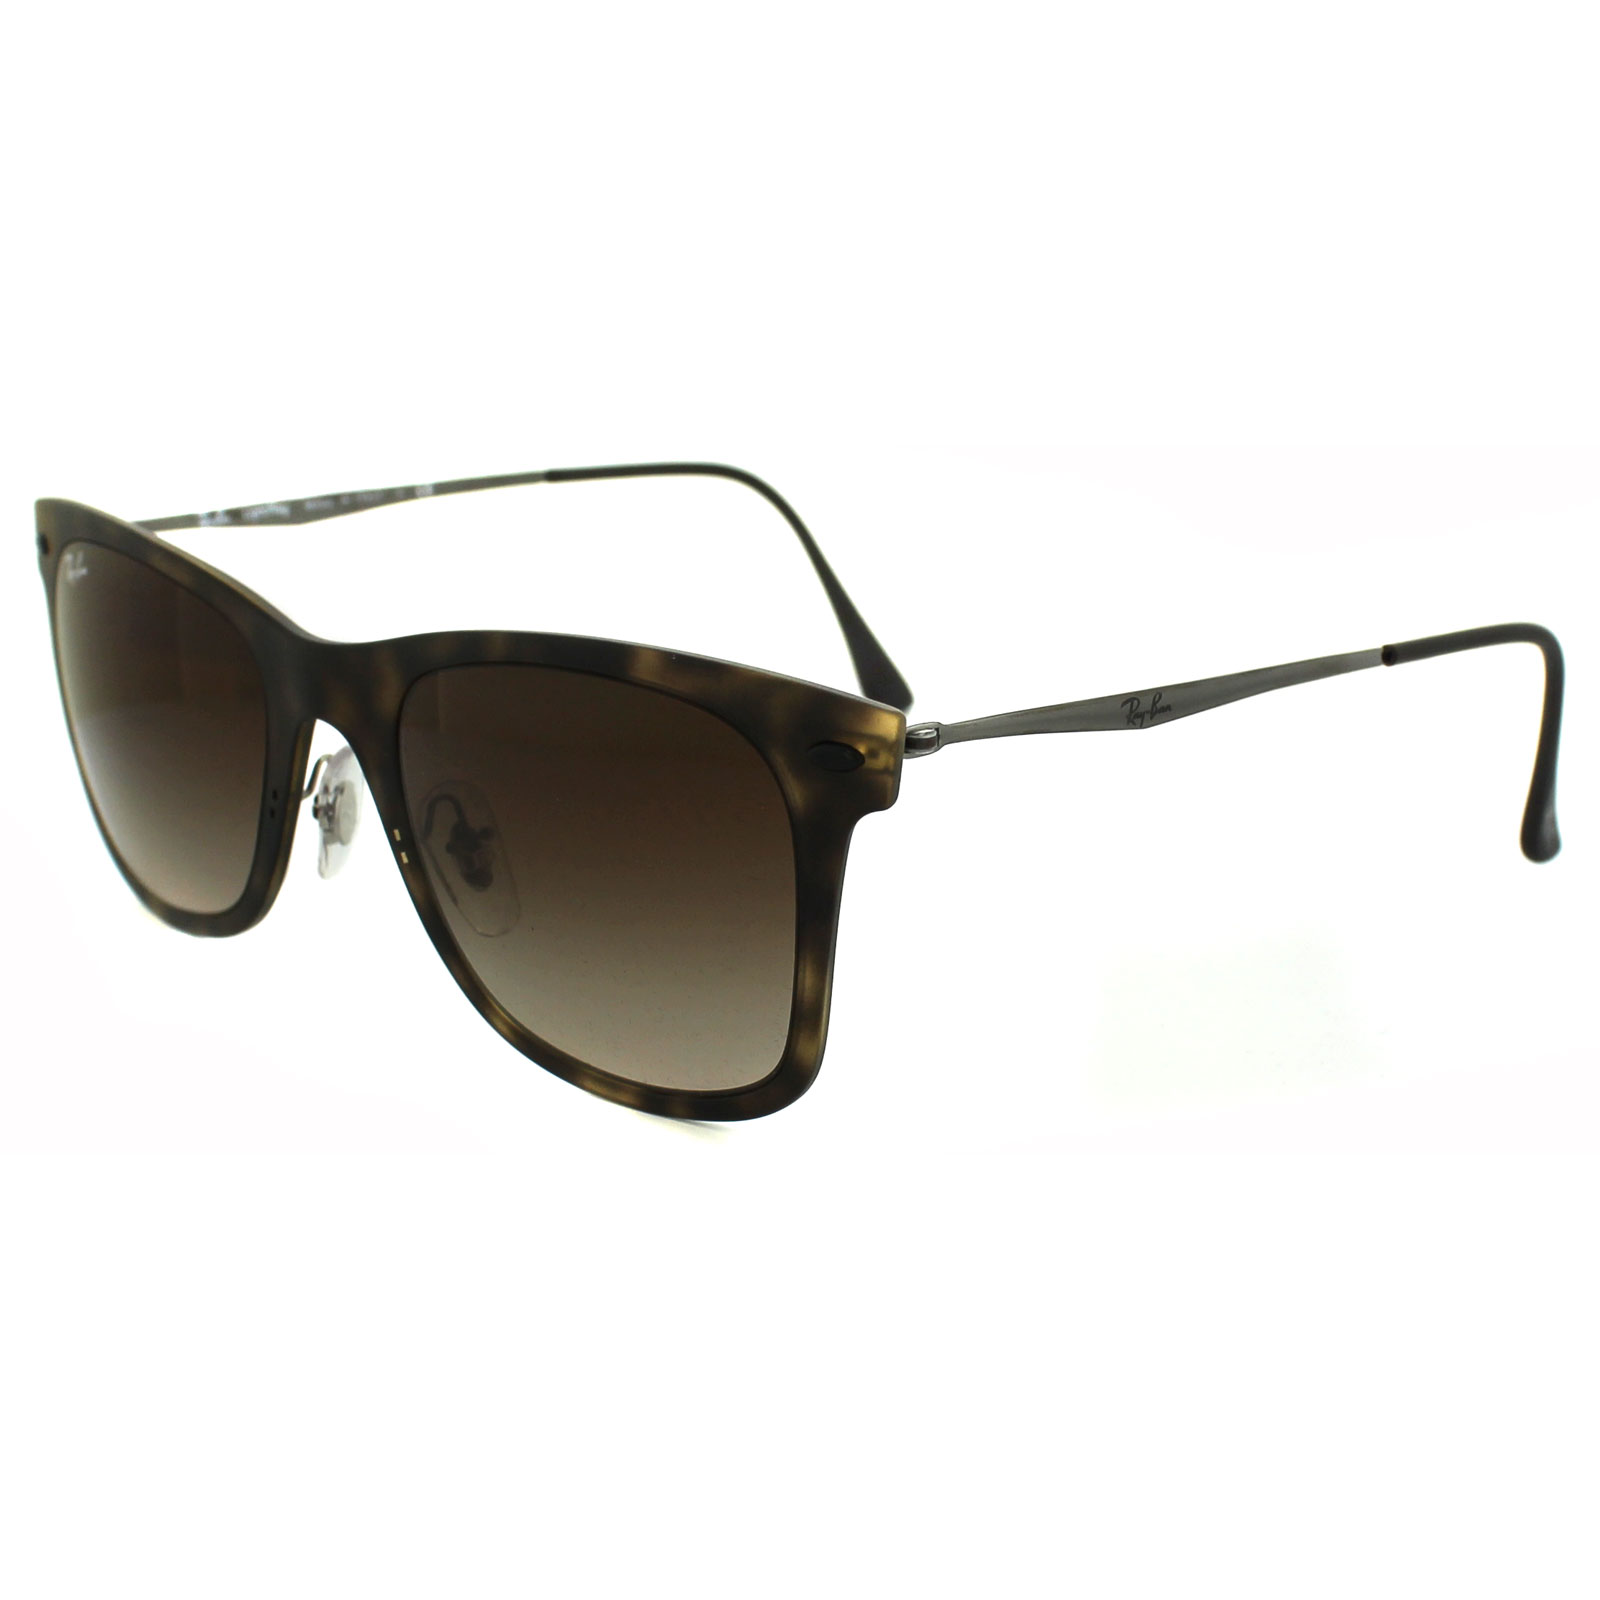 Ray ban sunglasses gradient - Sentinel Ray Ban Sunglasses Wayfarer Light Ray 4210 894 13 Tortoise Brown Gradient